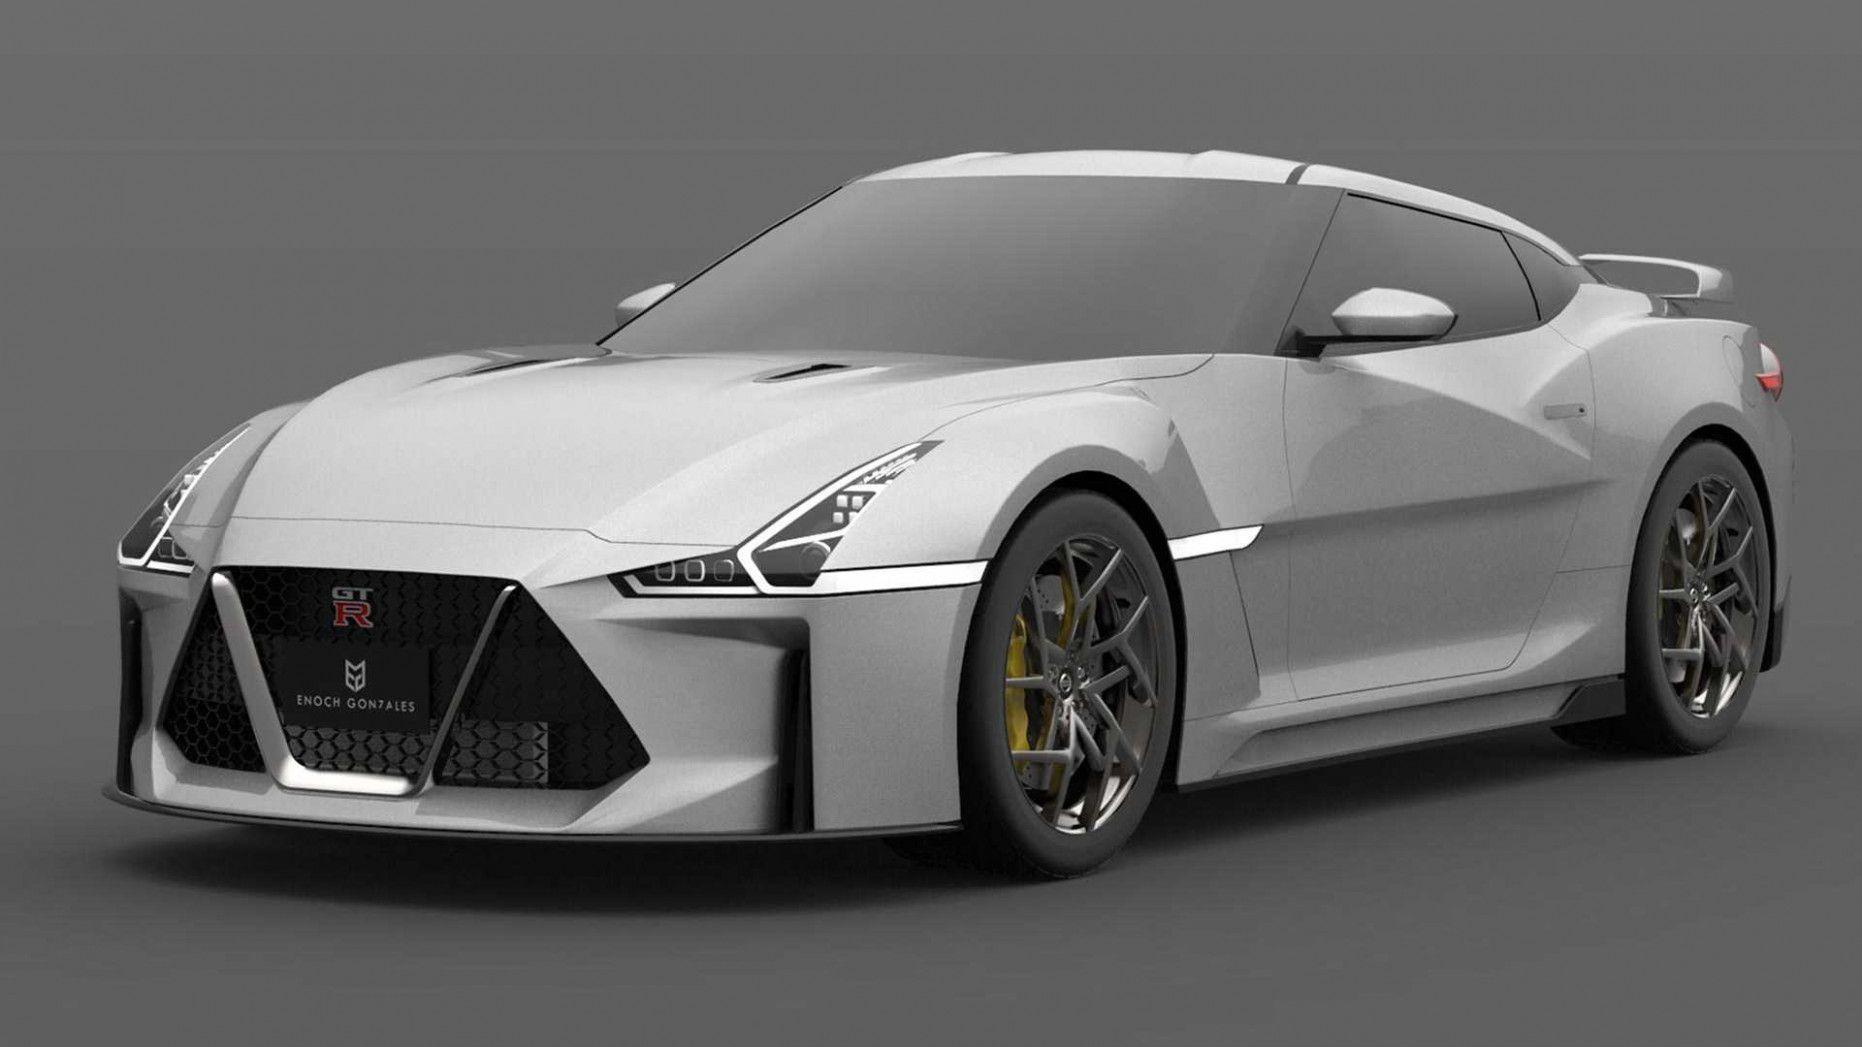 2021 Nissan Gtr Nismo Hybrid Spesification